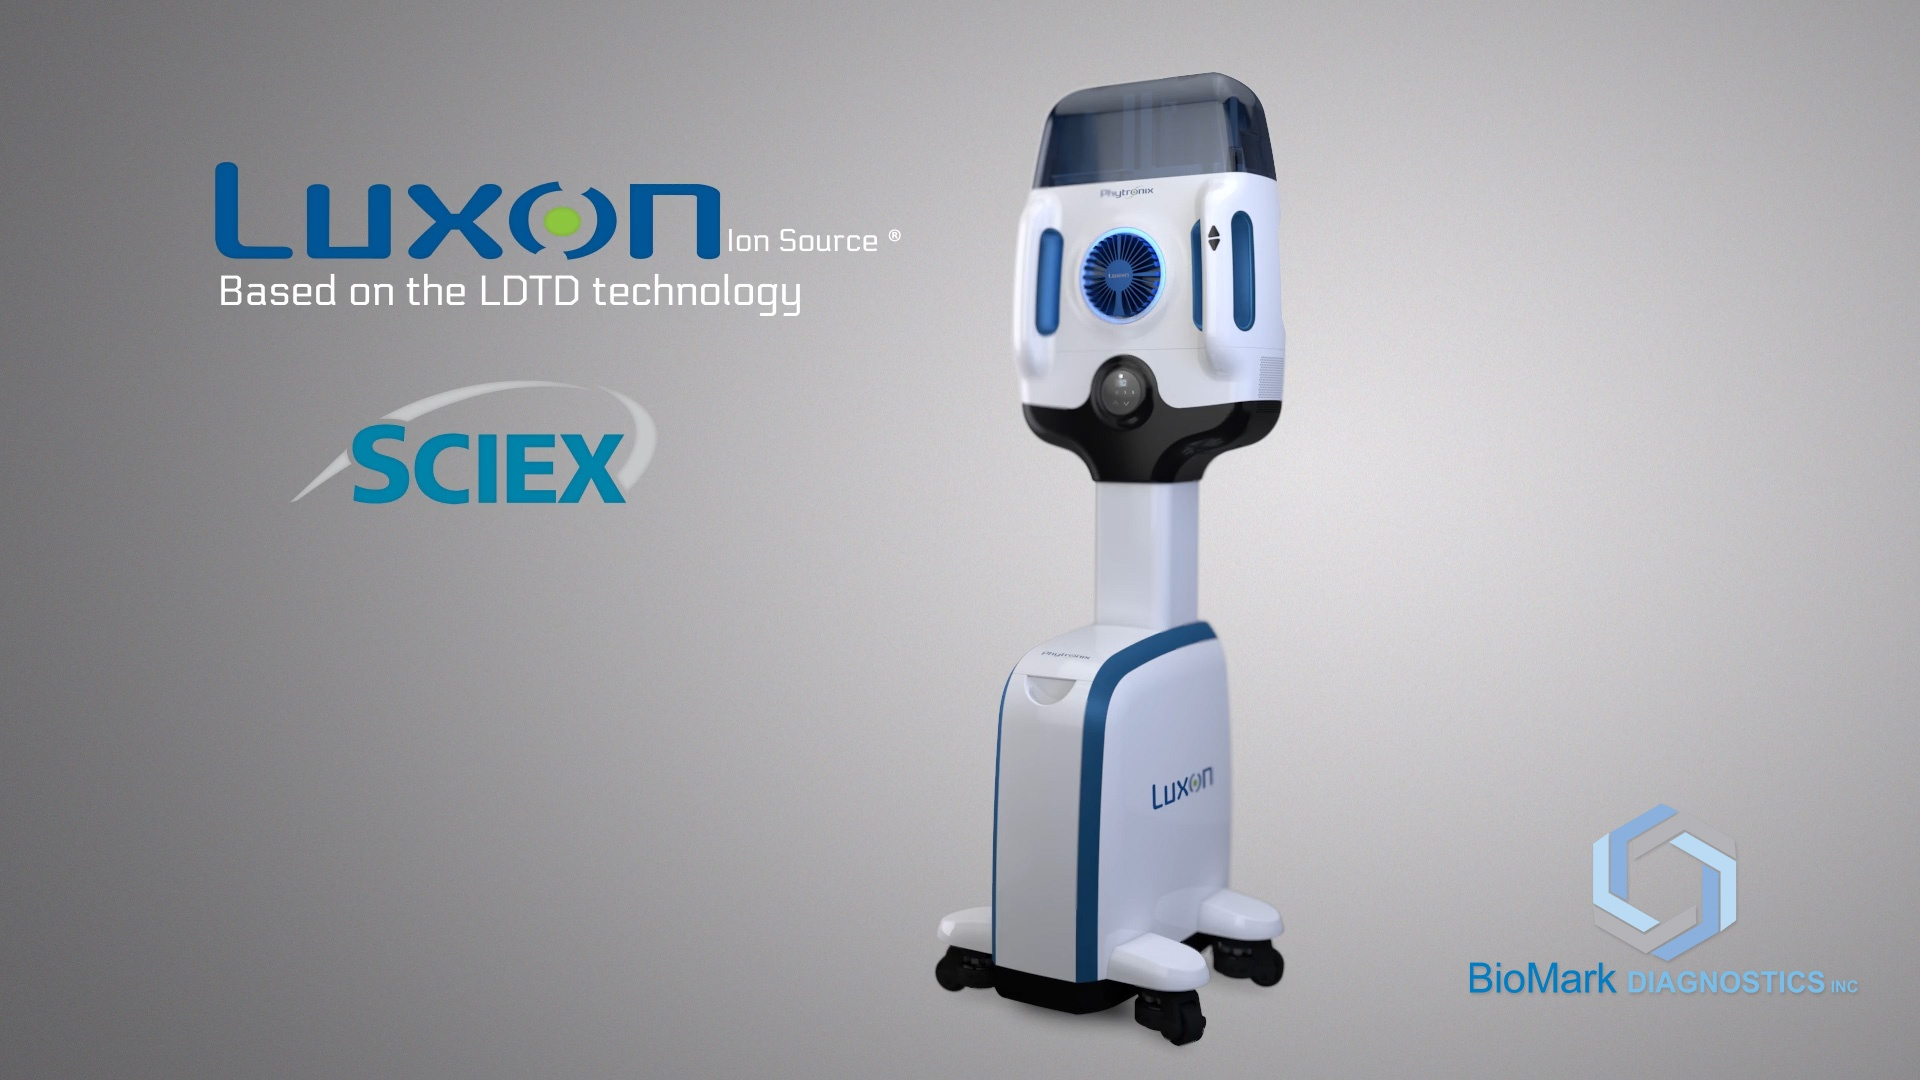 biomark diagnostics phytronix partnership